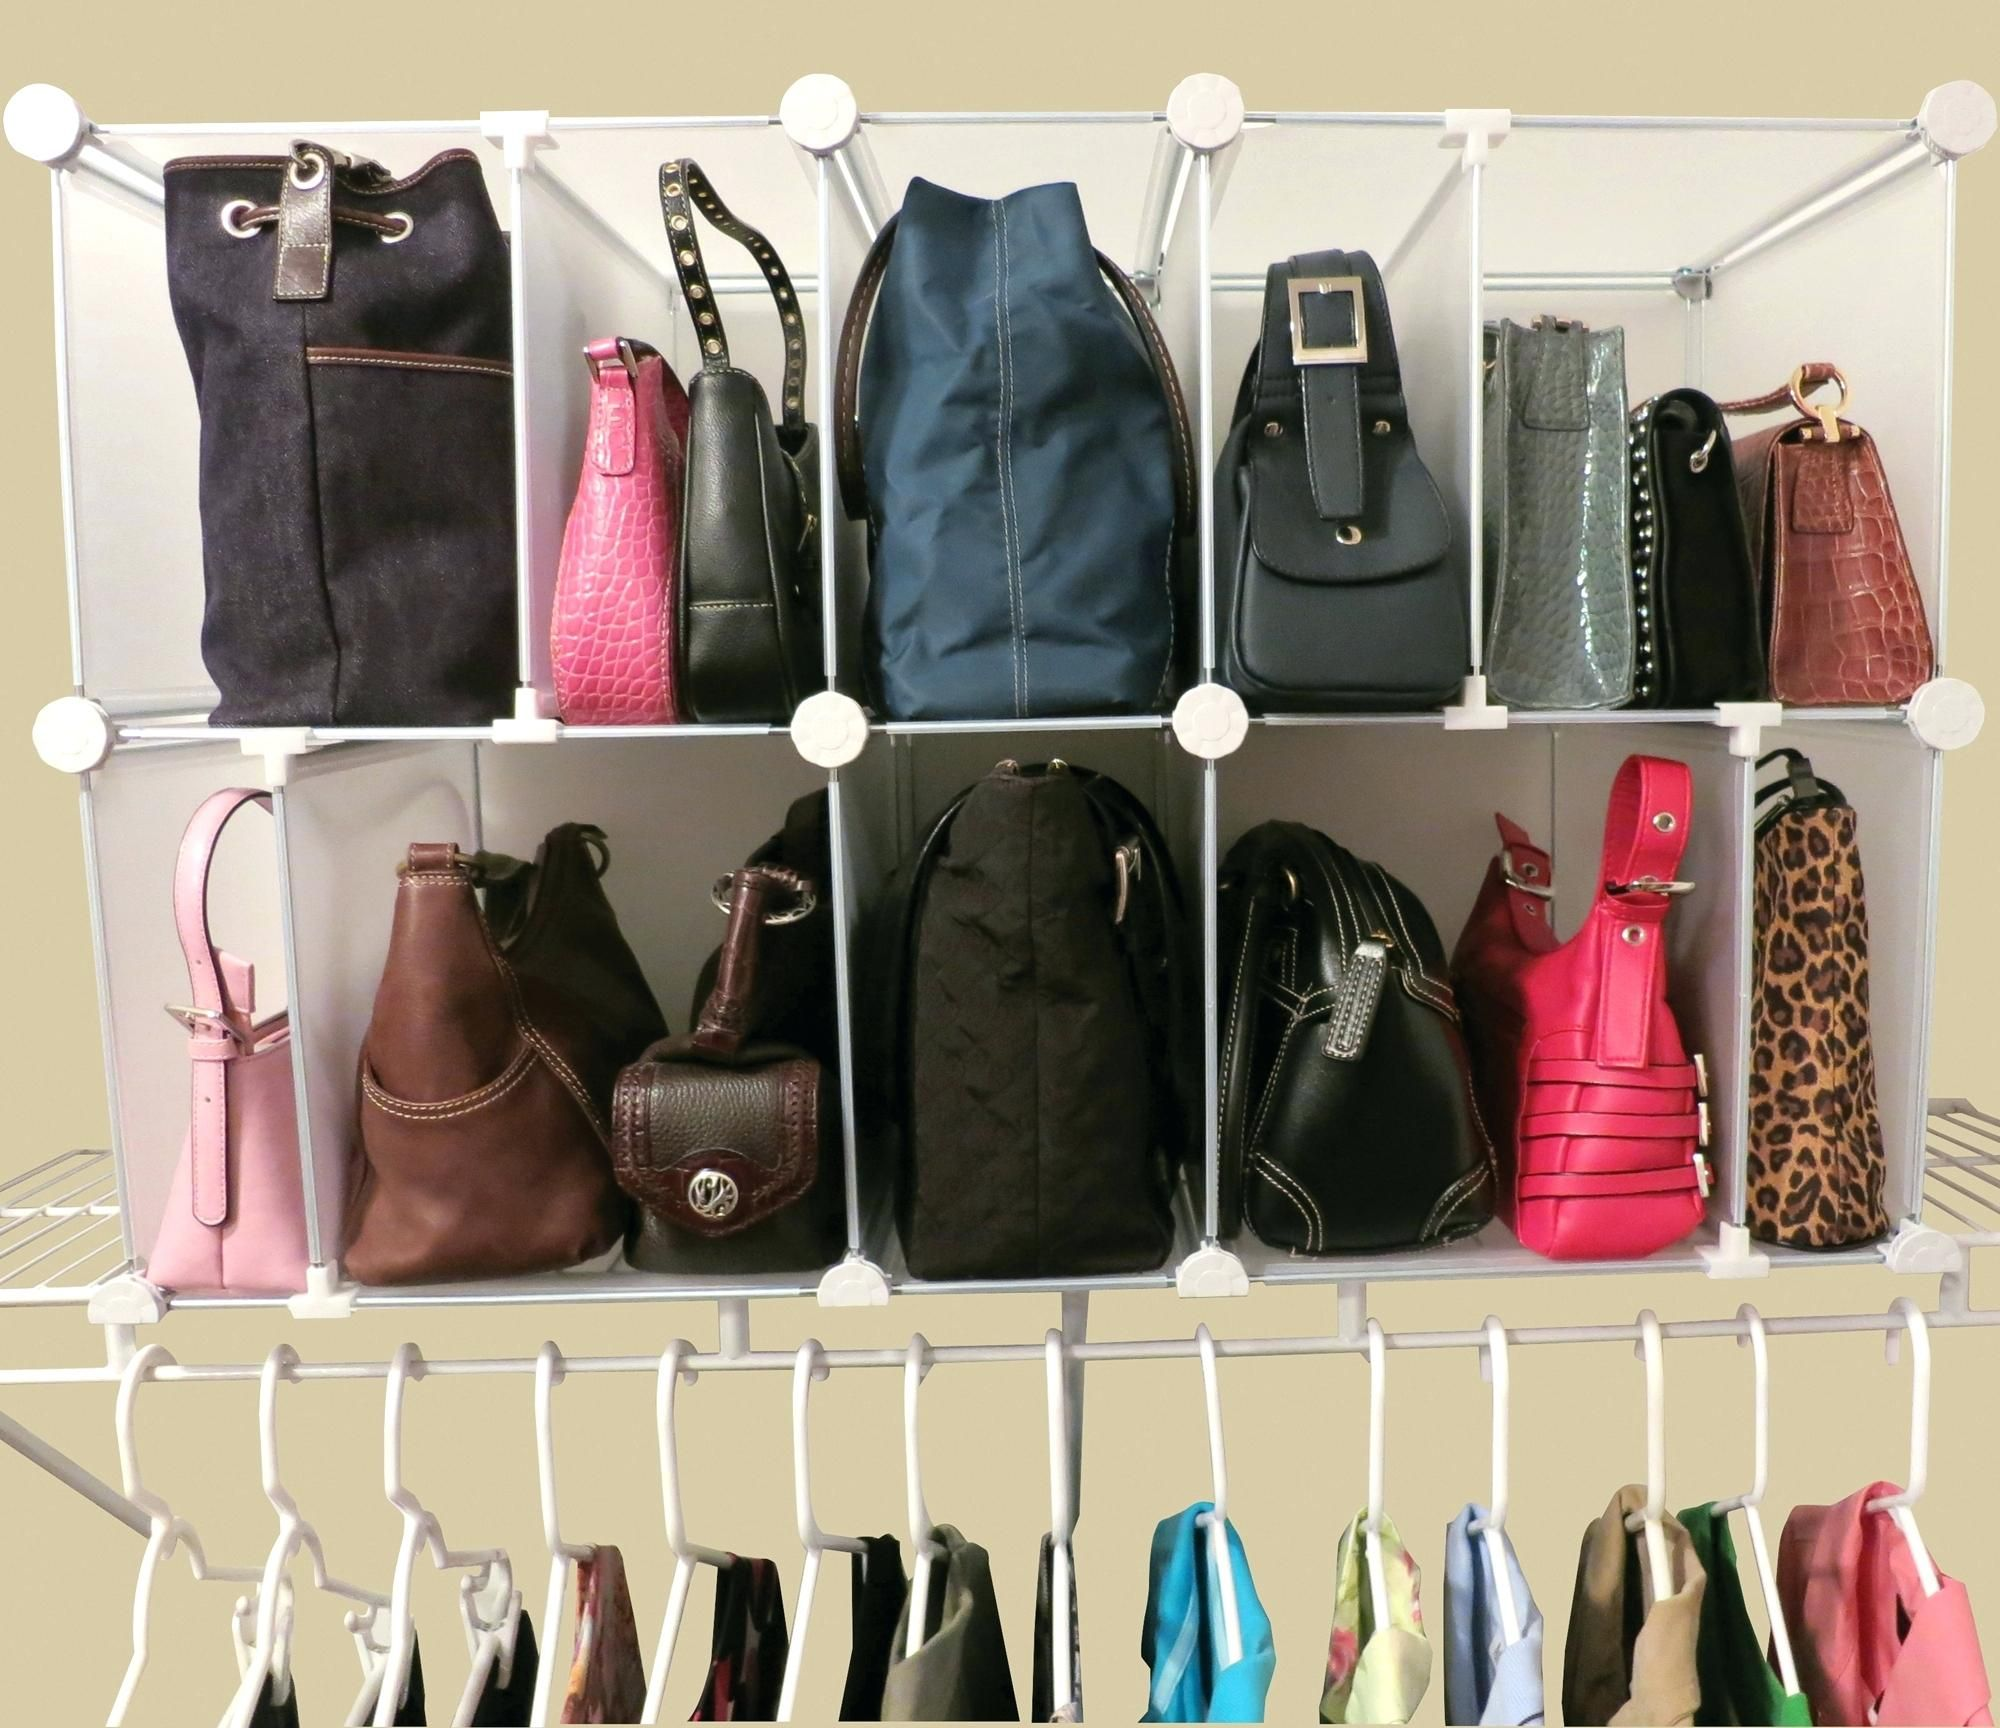 Purse Cubby Organizer Modular Imagehanging Storage Bags Shelf Closet Organization Organizing Purses In Closet Handbag Storage